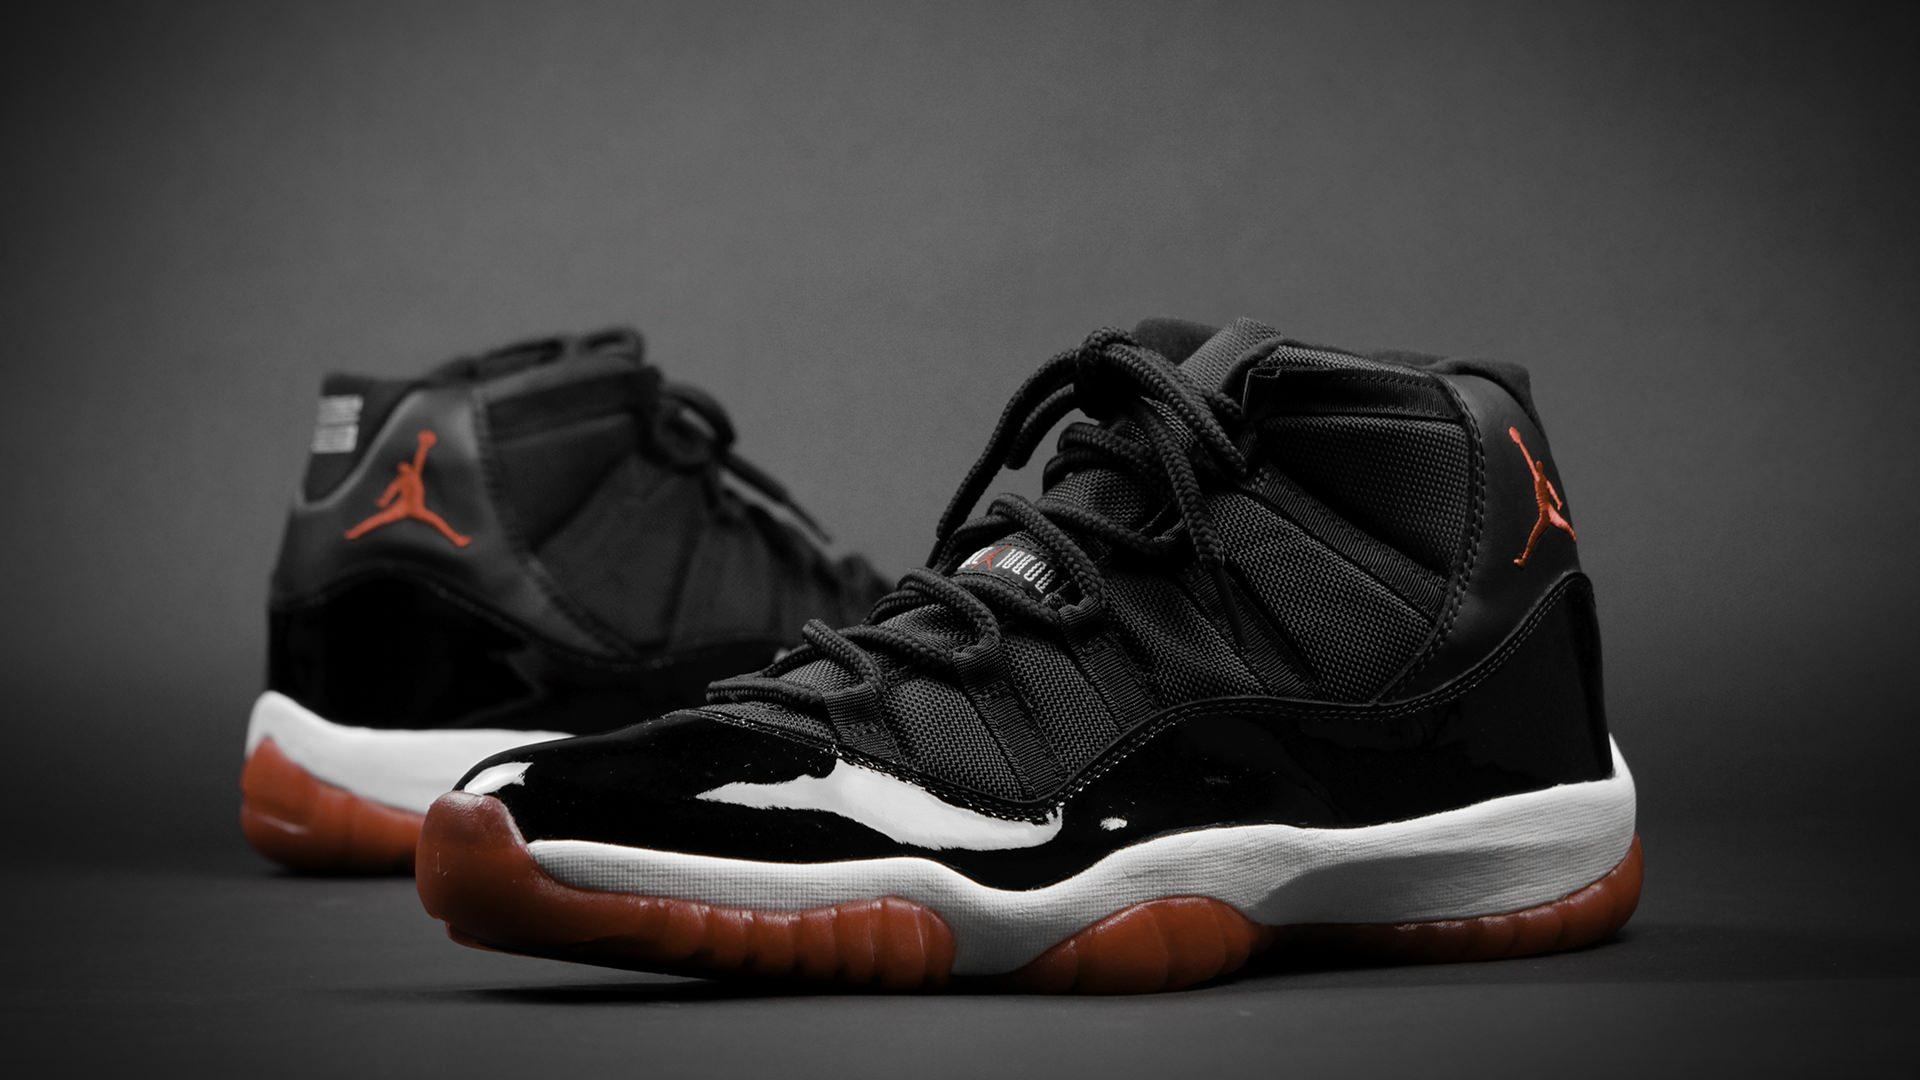 Michael Jordan Shoes Wallpaper